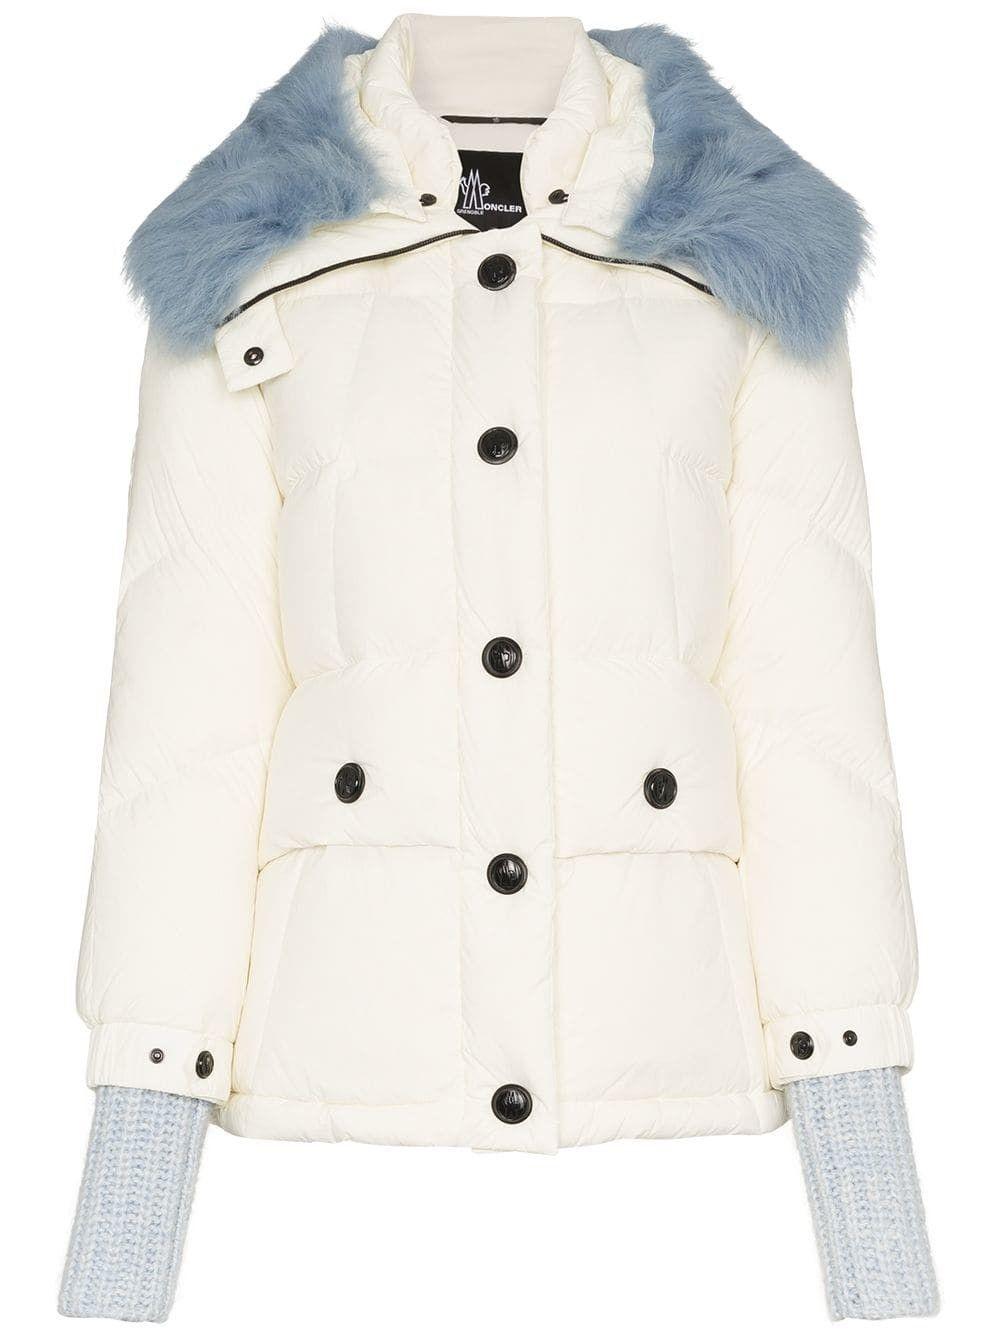 Pin by Simona 758 on eiridkm Padded jacket, Winter